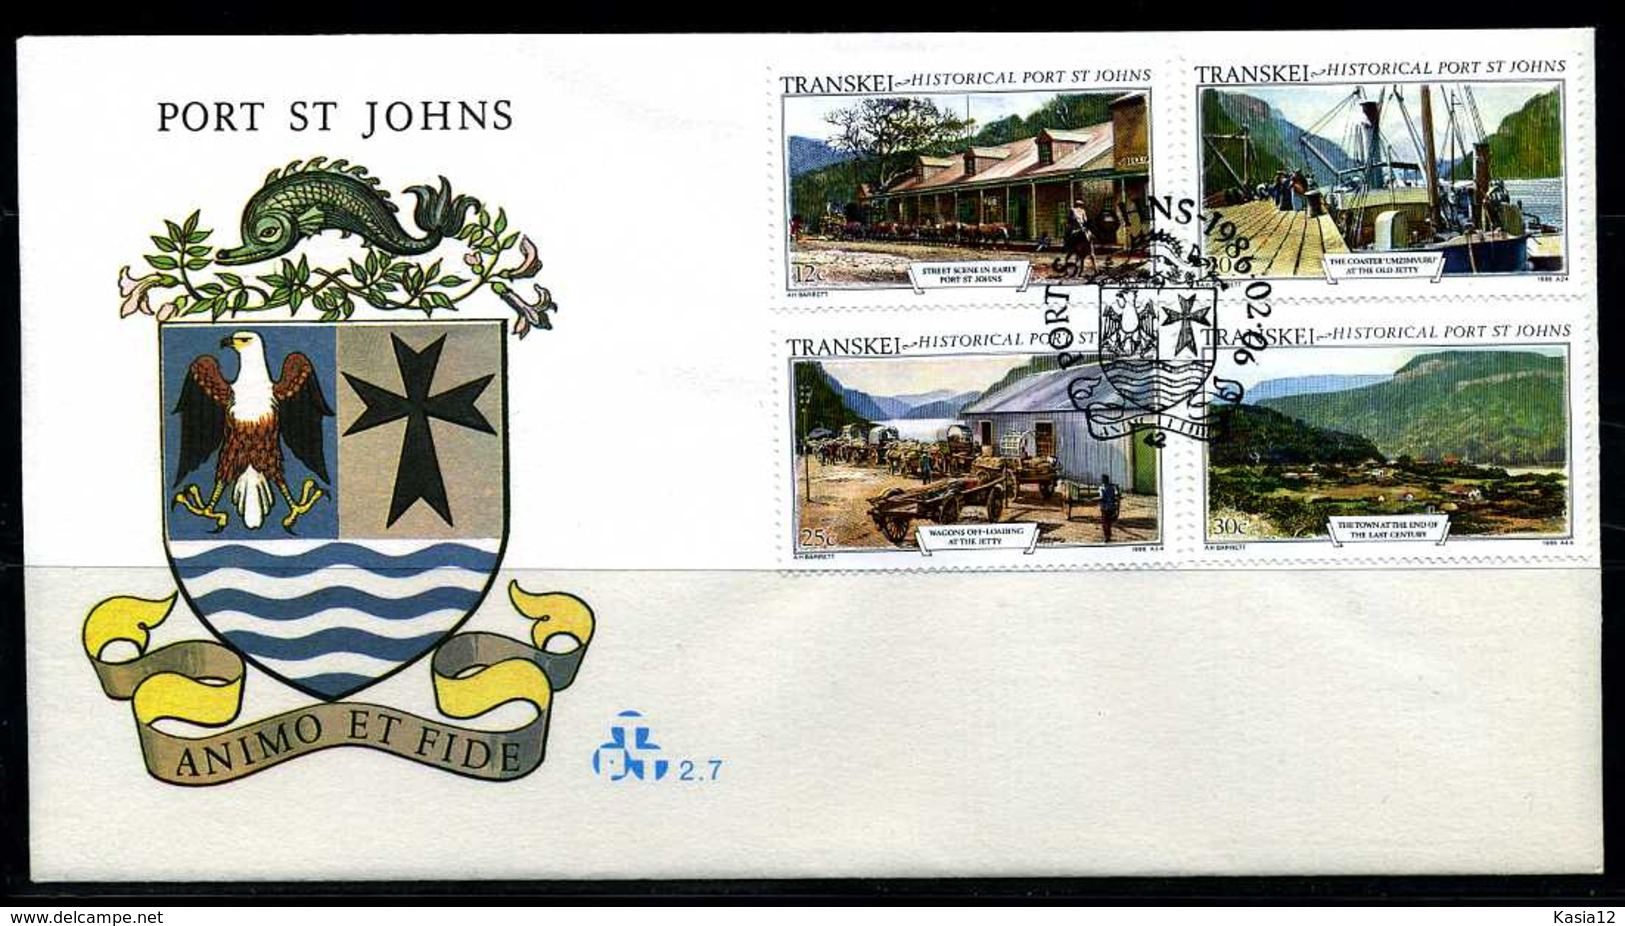 E01140)Transkei FDC 1180/3 Port St. Johns - Transkei